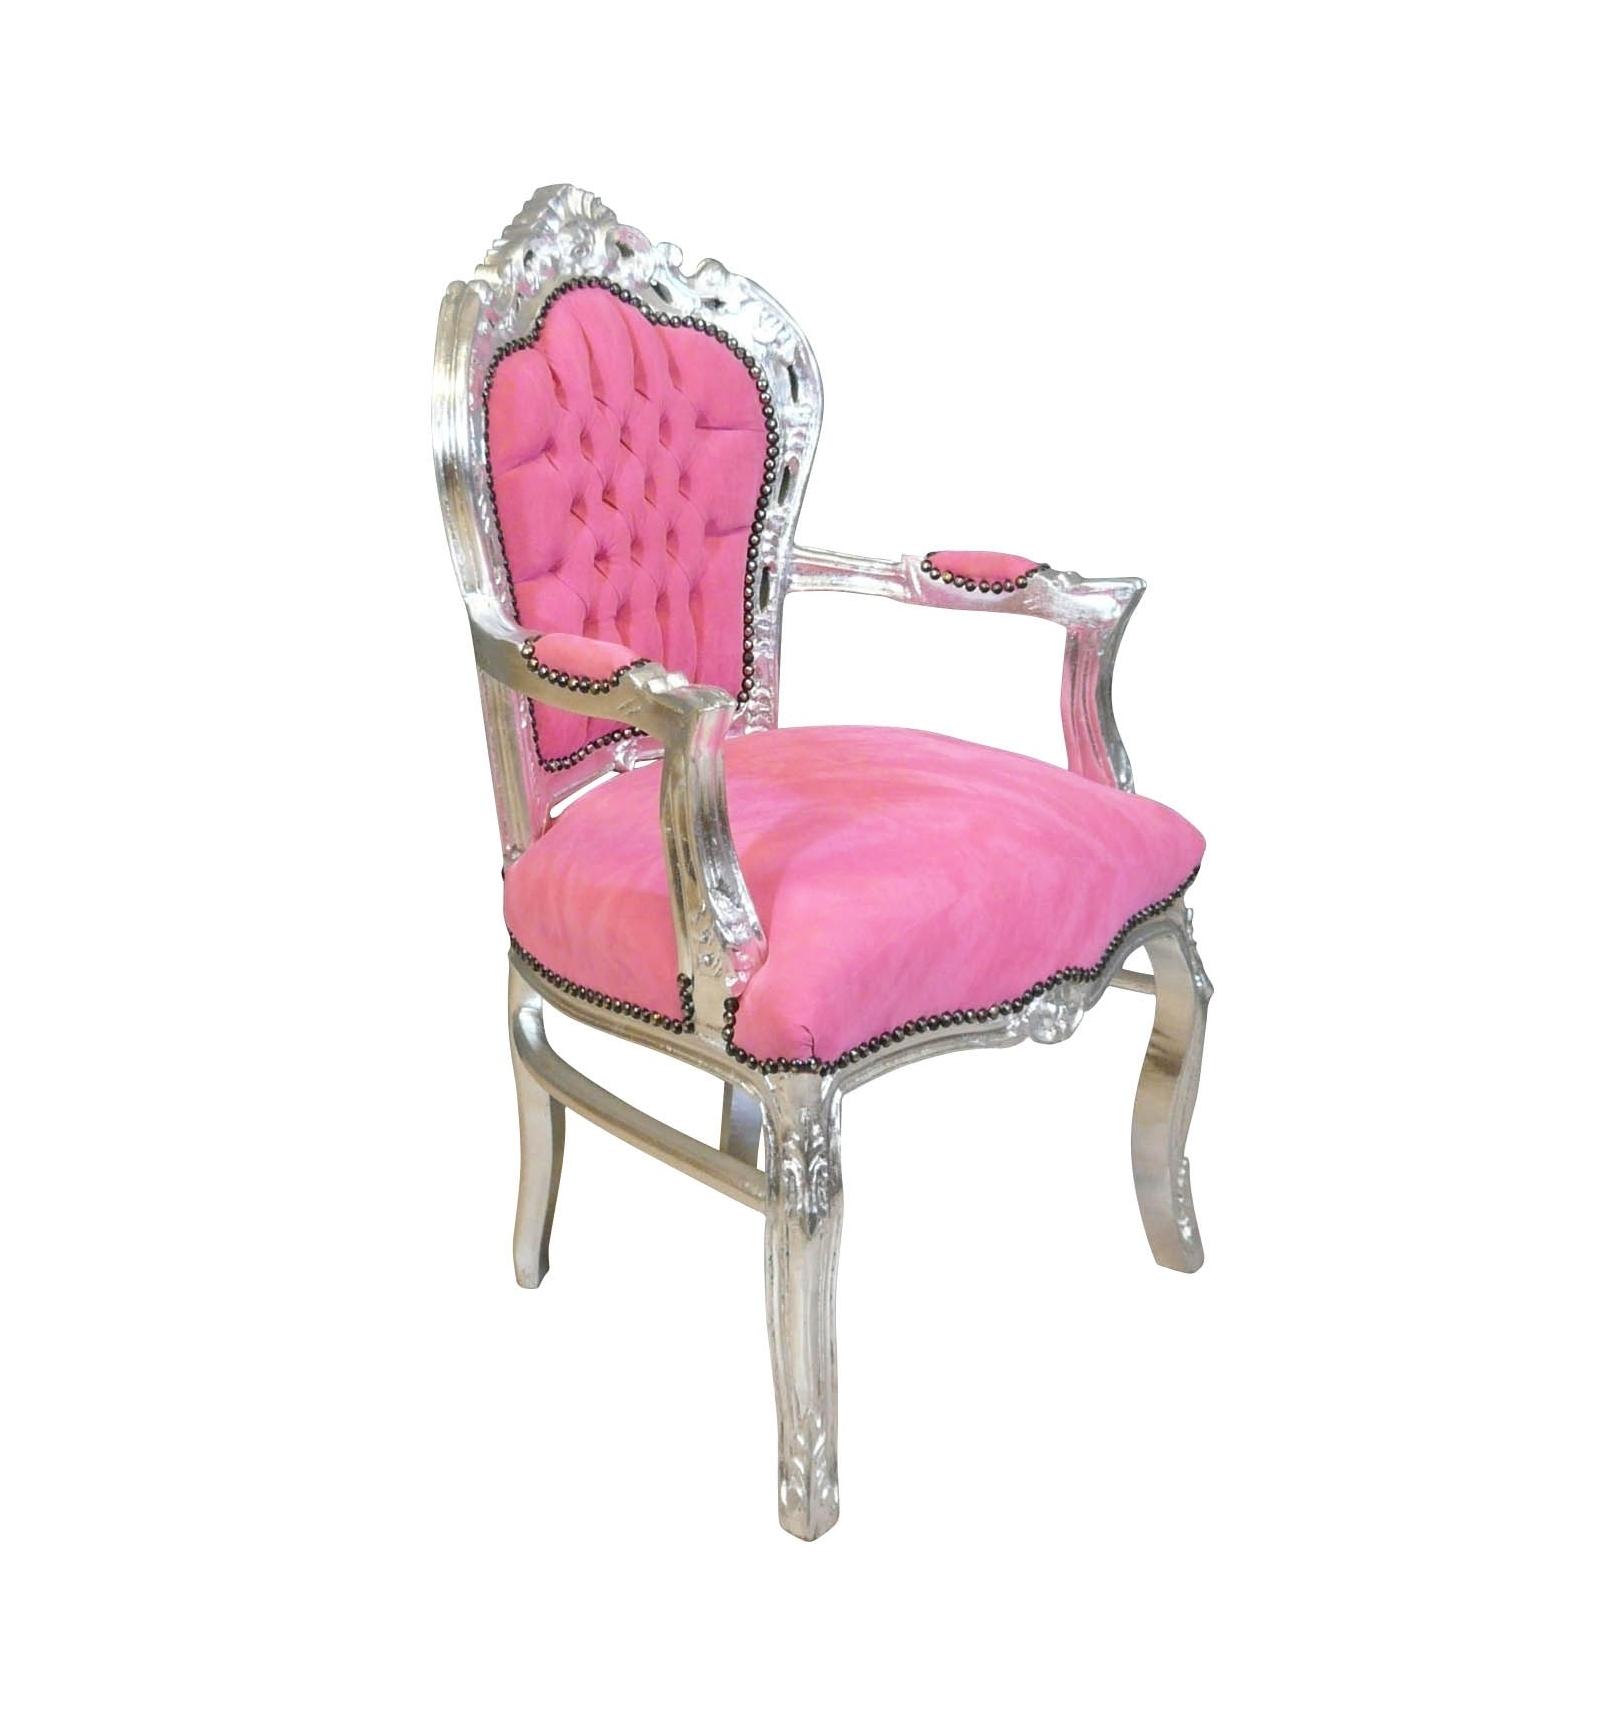 fauteuil rose style baroque - Fauteuil Rose Pas Cher